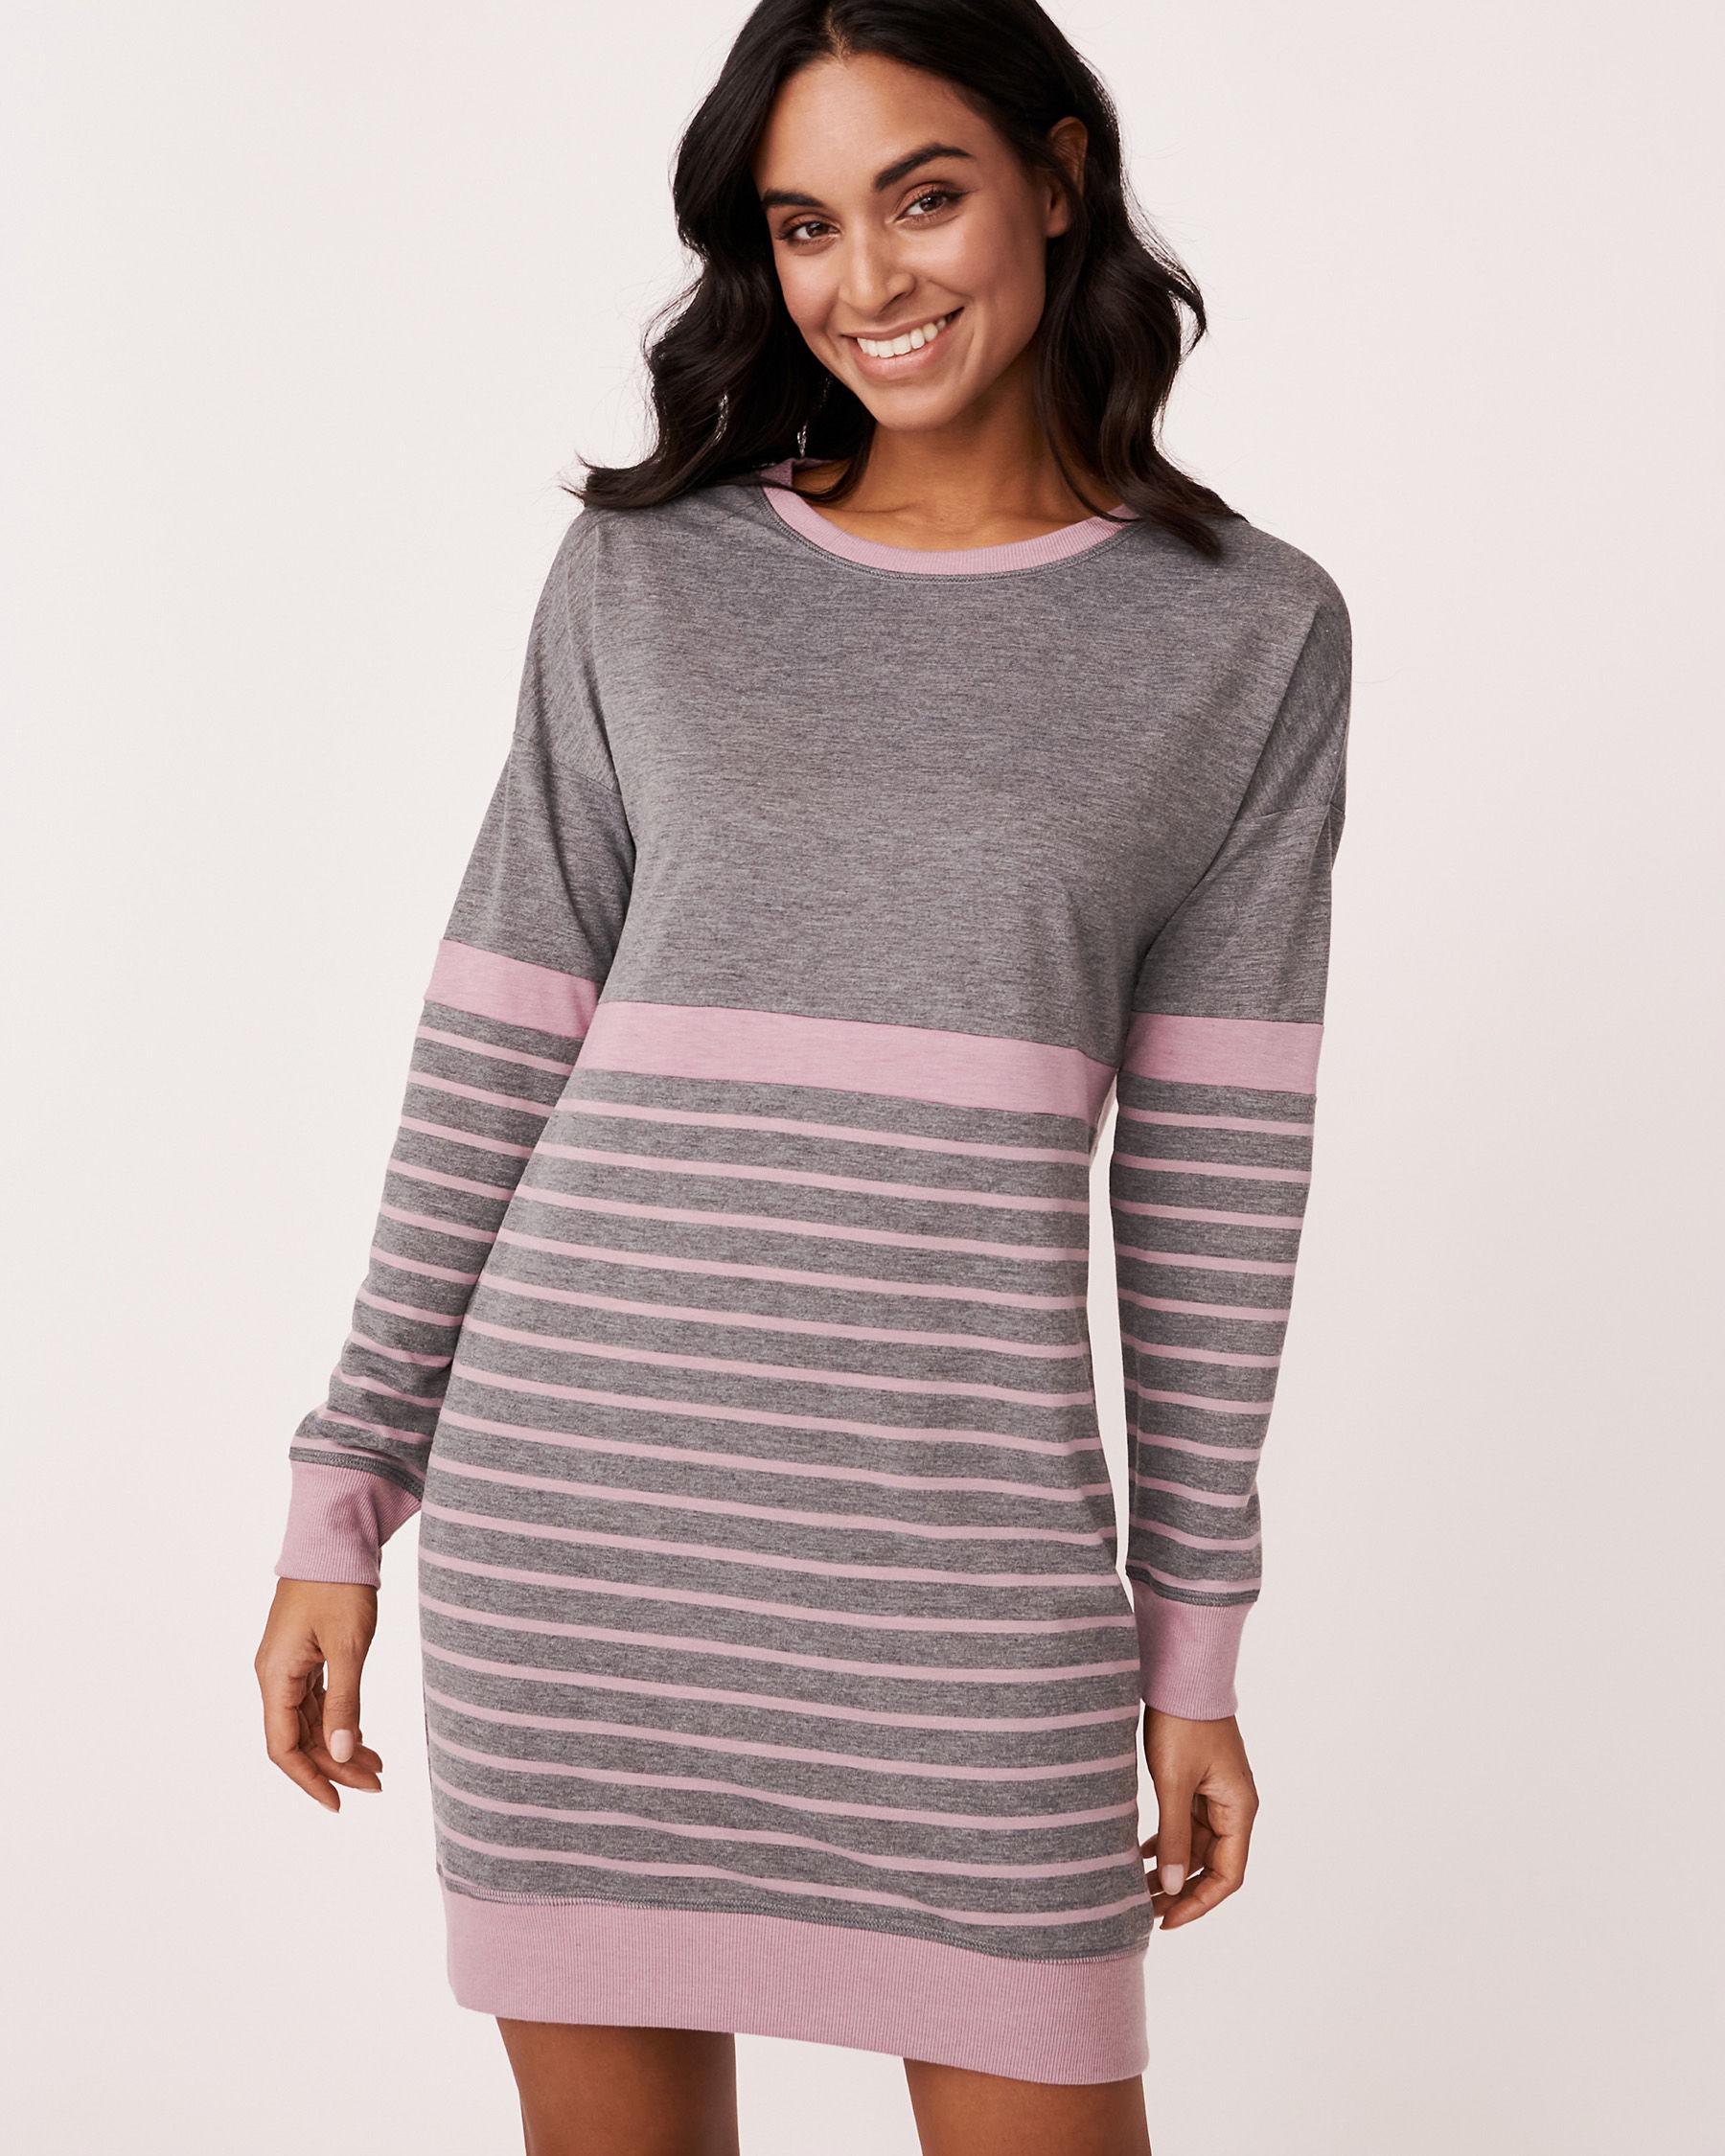 LA VIE EN ROSE Long Sleeve Striped Dress Grey and pink mix 768-374-0-11 - View1